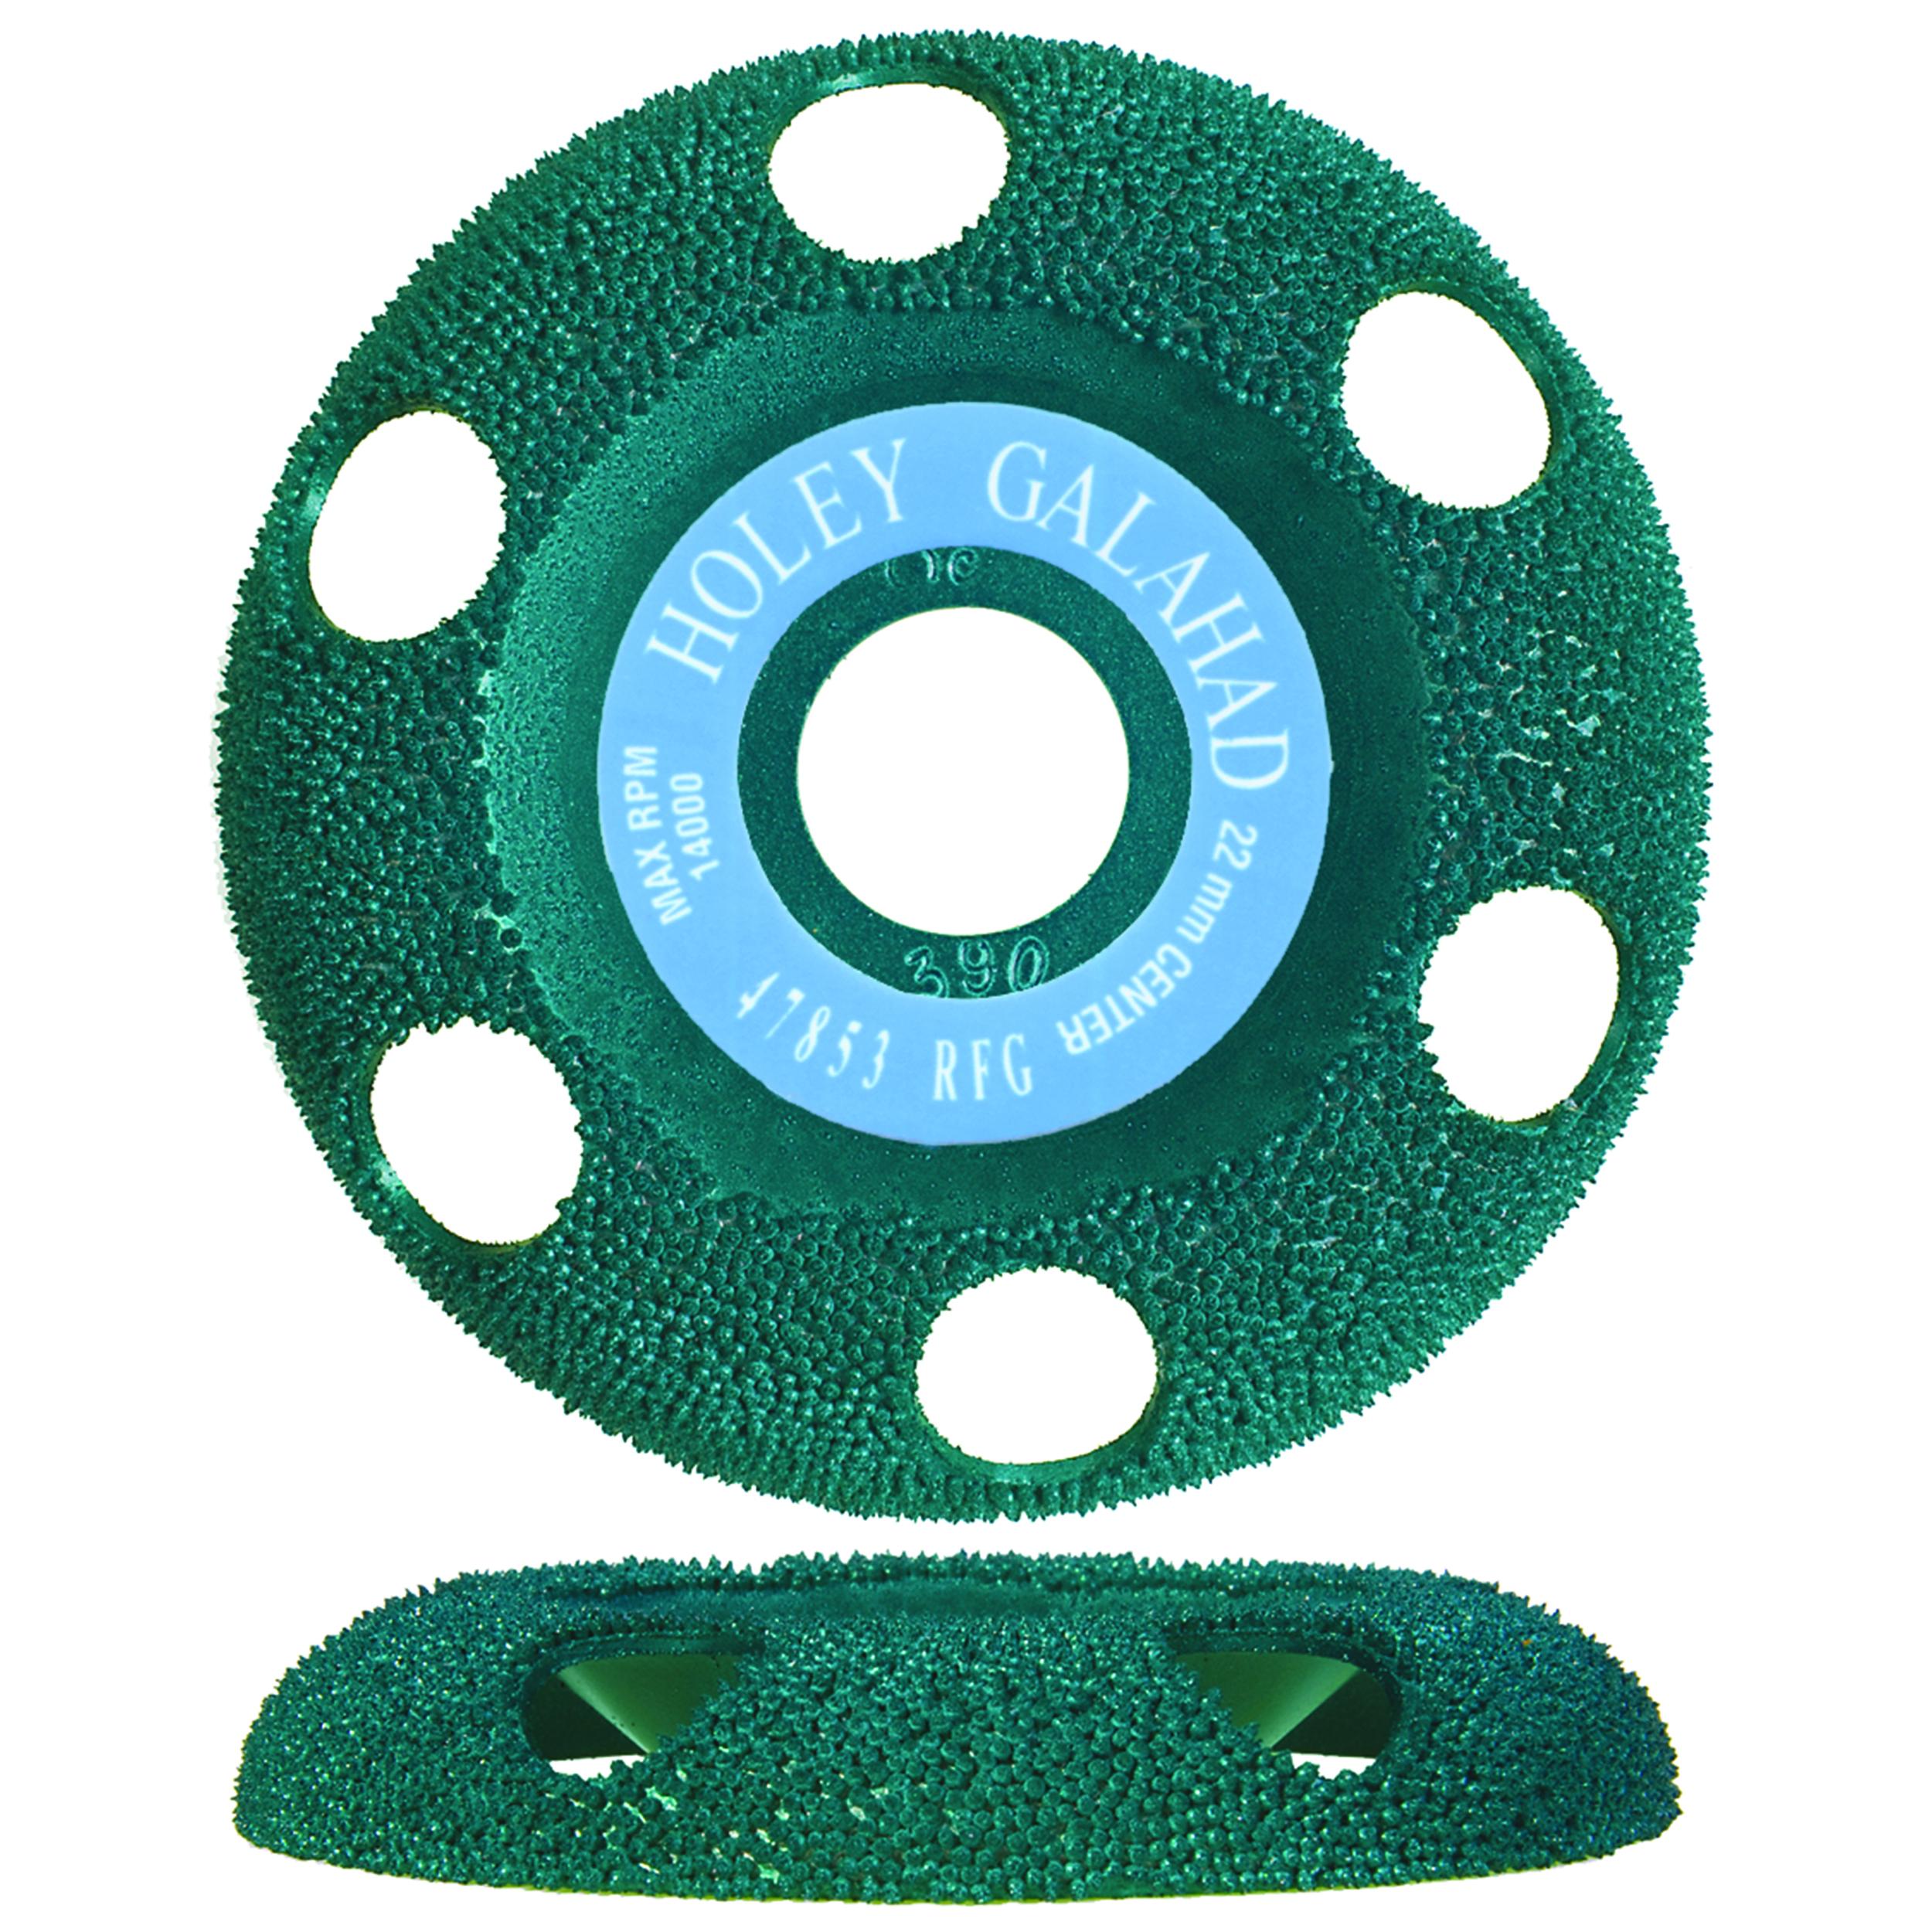 Holey Galahad See Through Disc Round Fine, Green 7/8